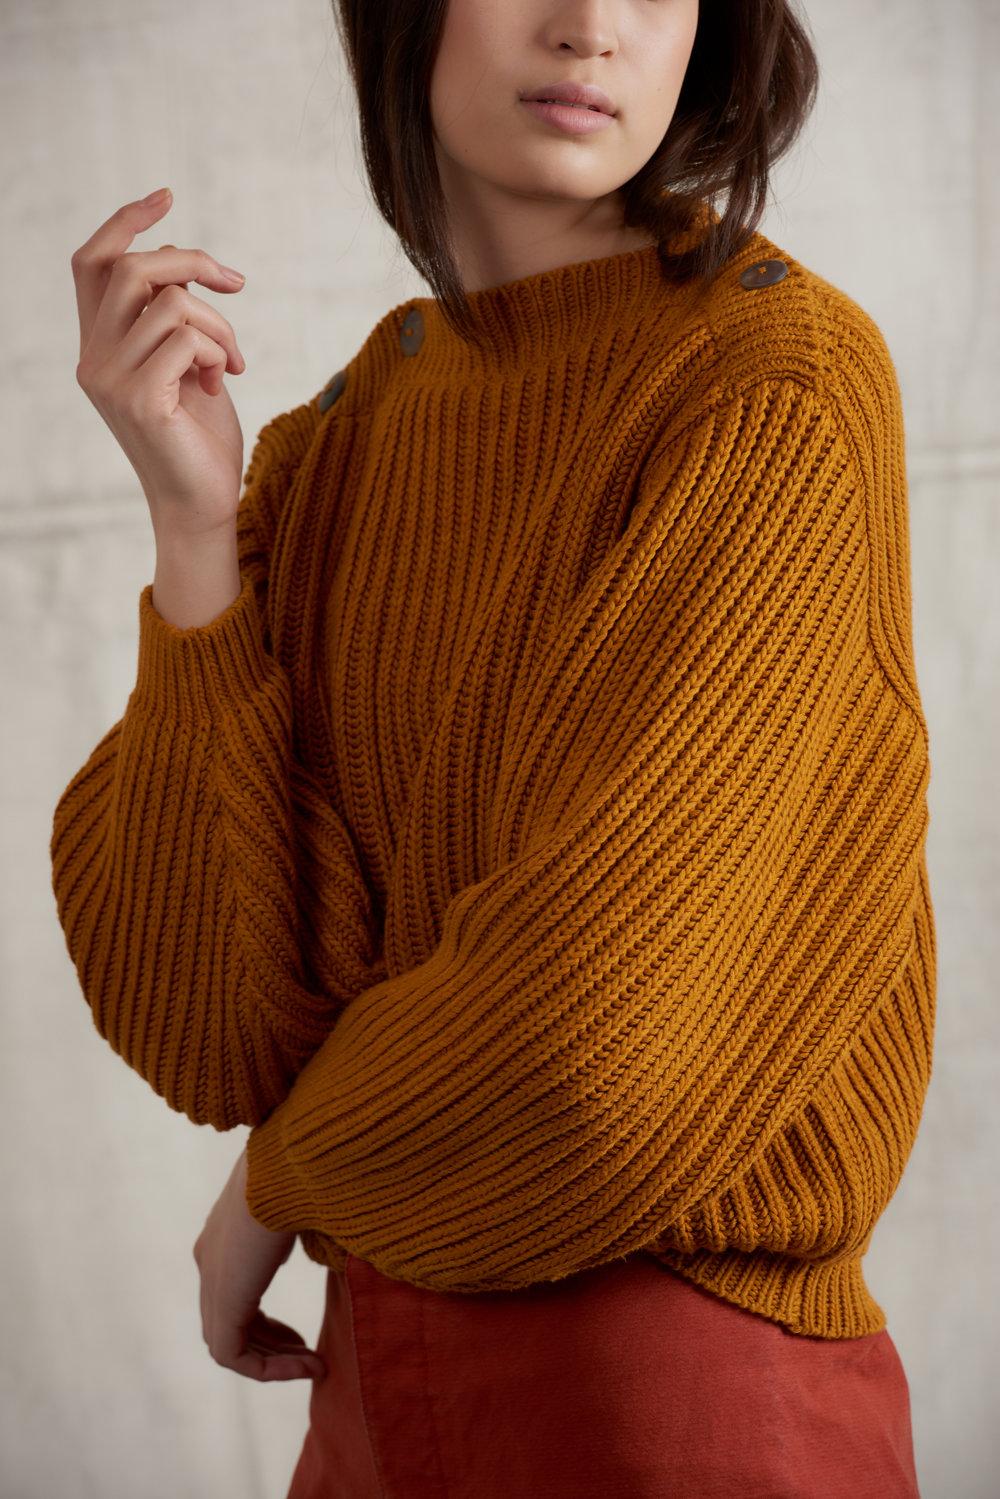 misha-and-puff-fisherman-pullover-marigold_86.jpg